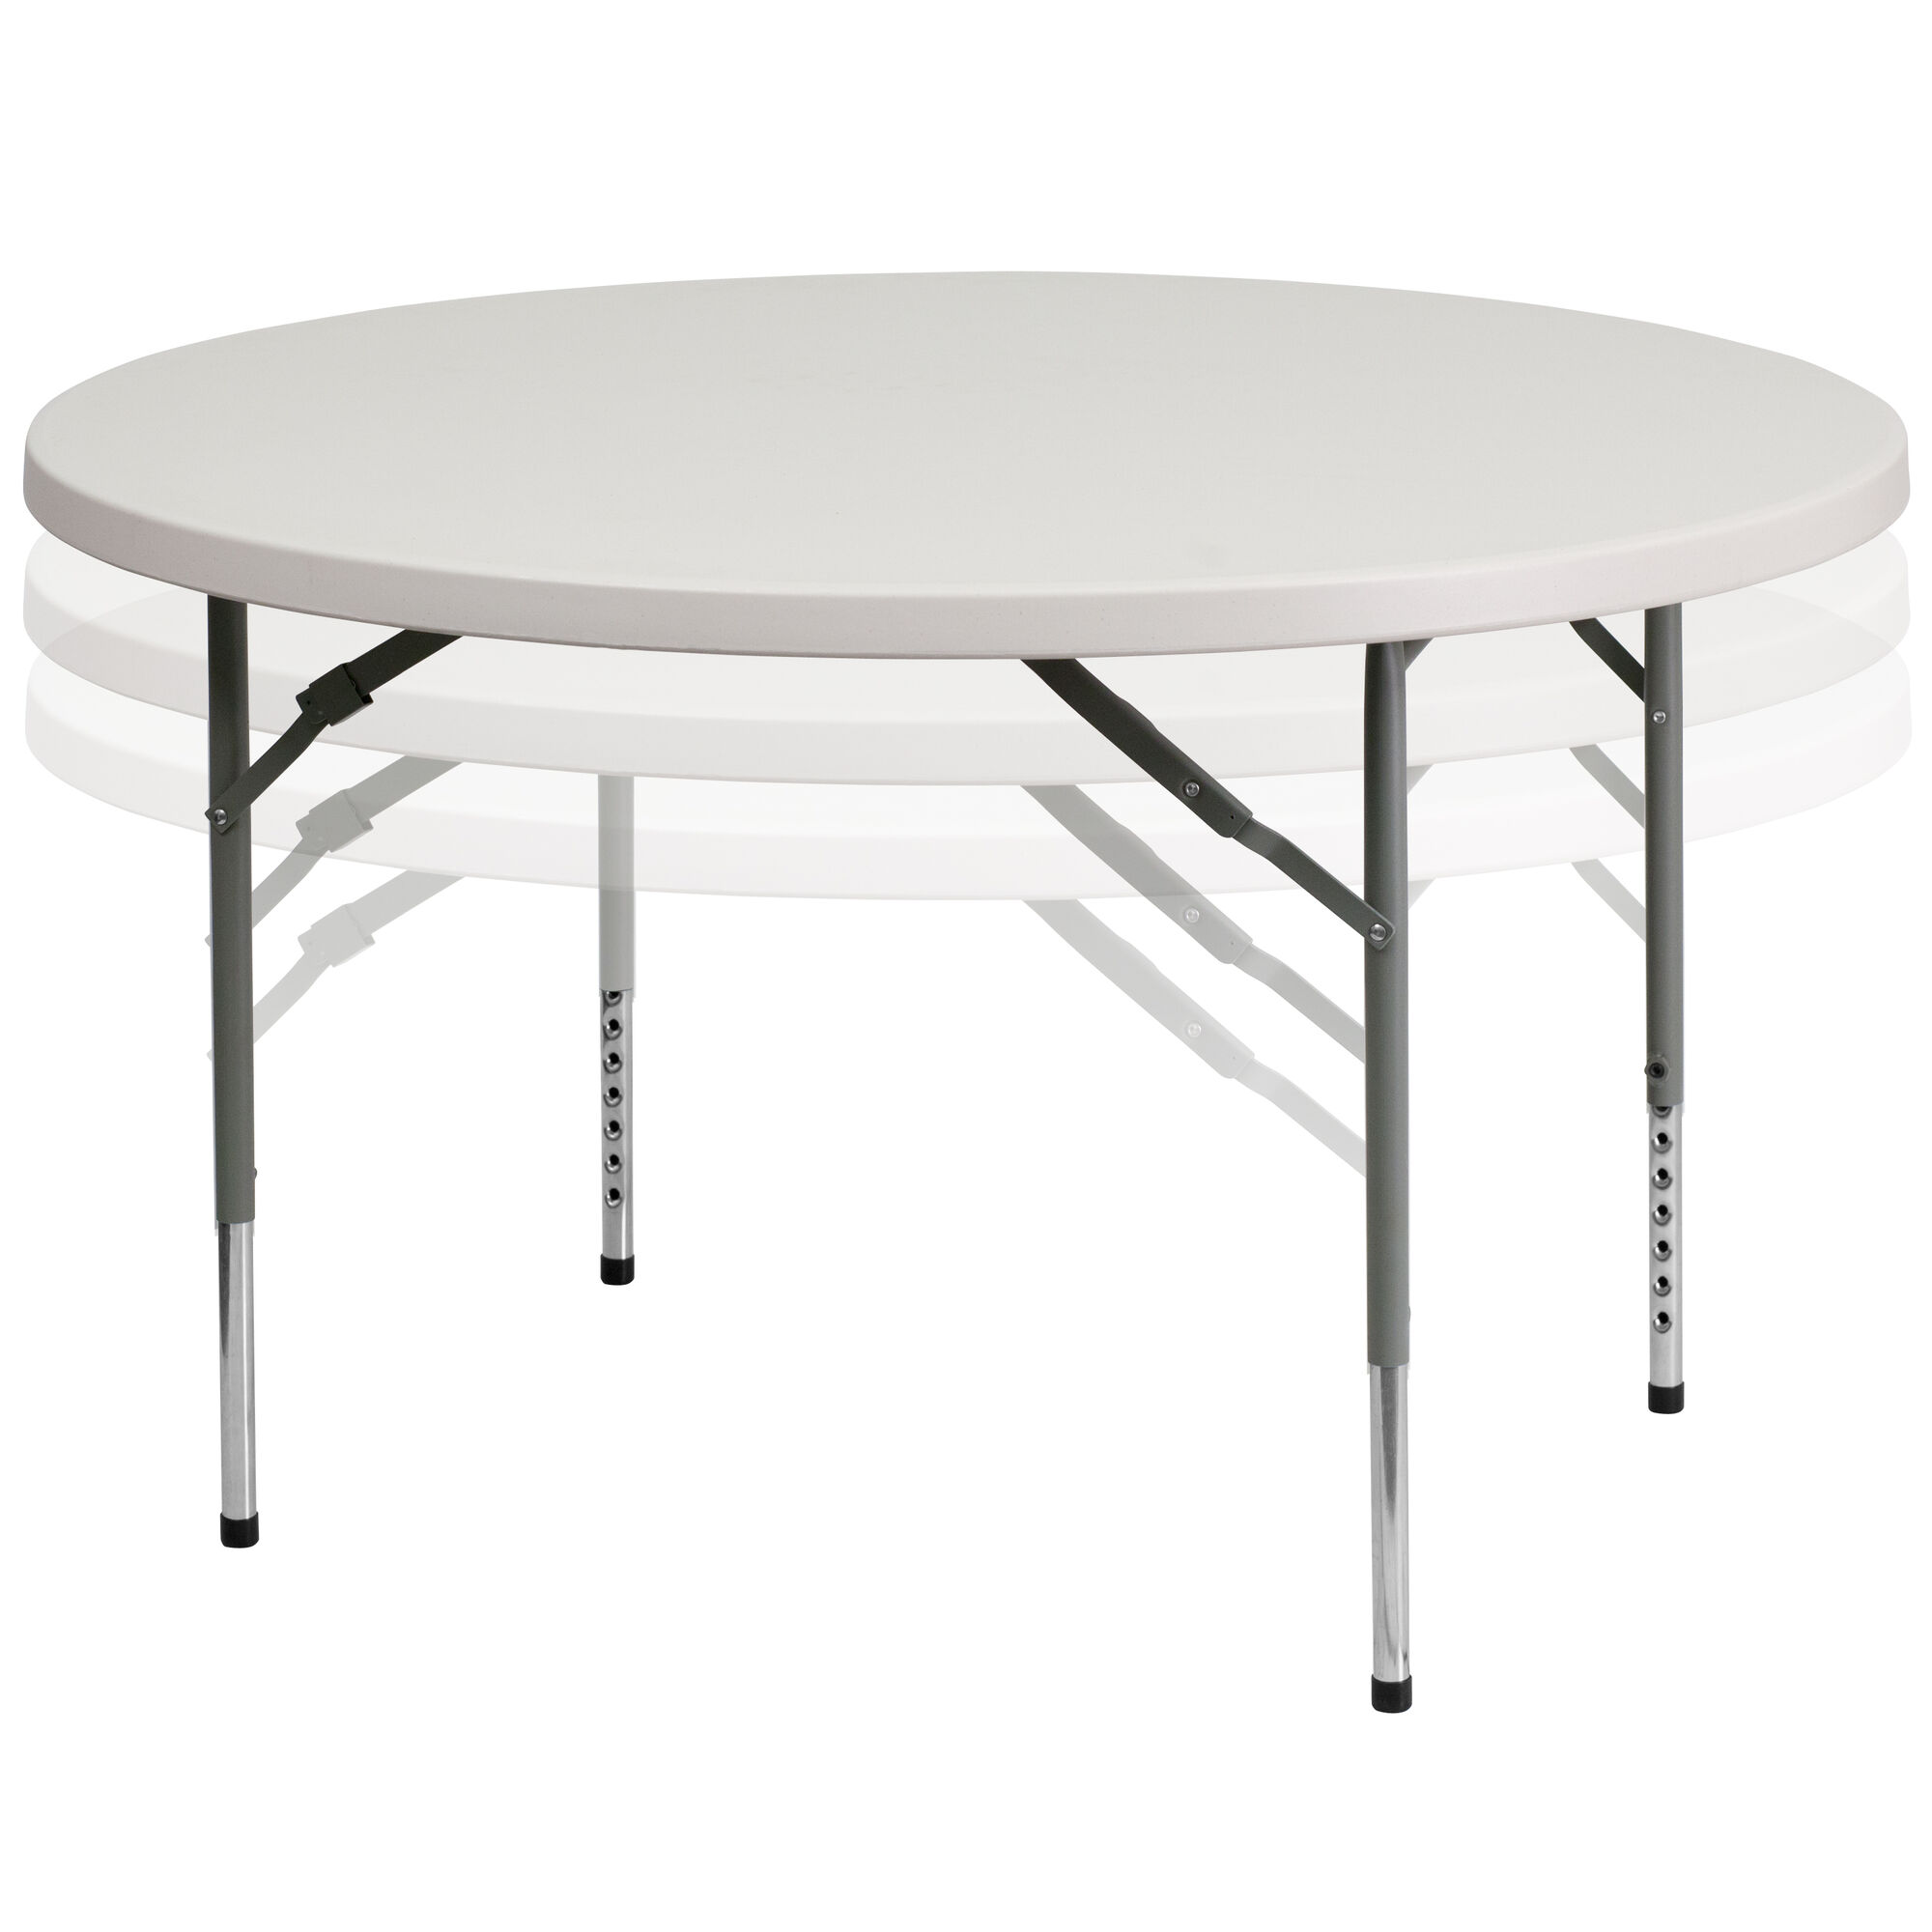 Fold In Half Adjule Height Table Design Ideas